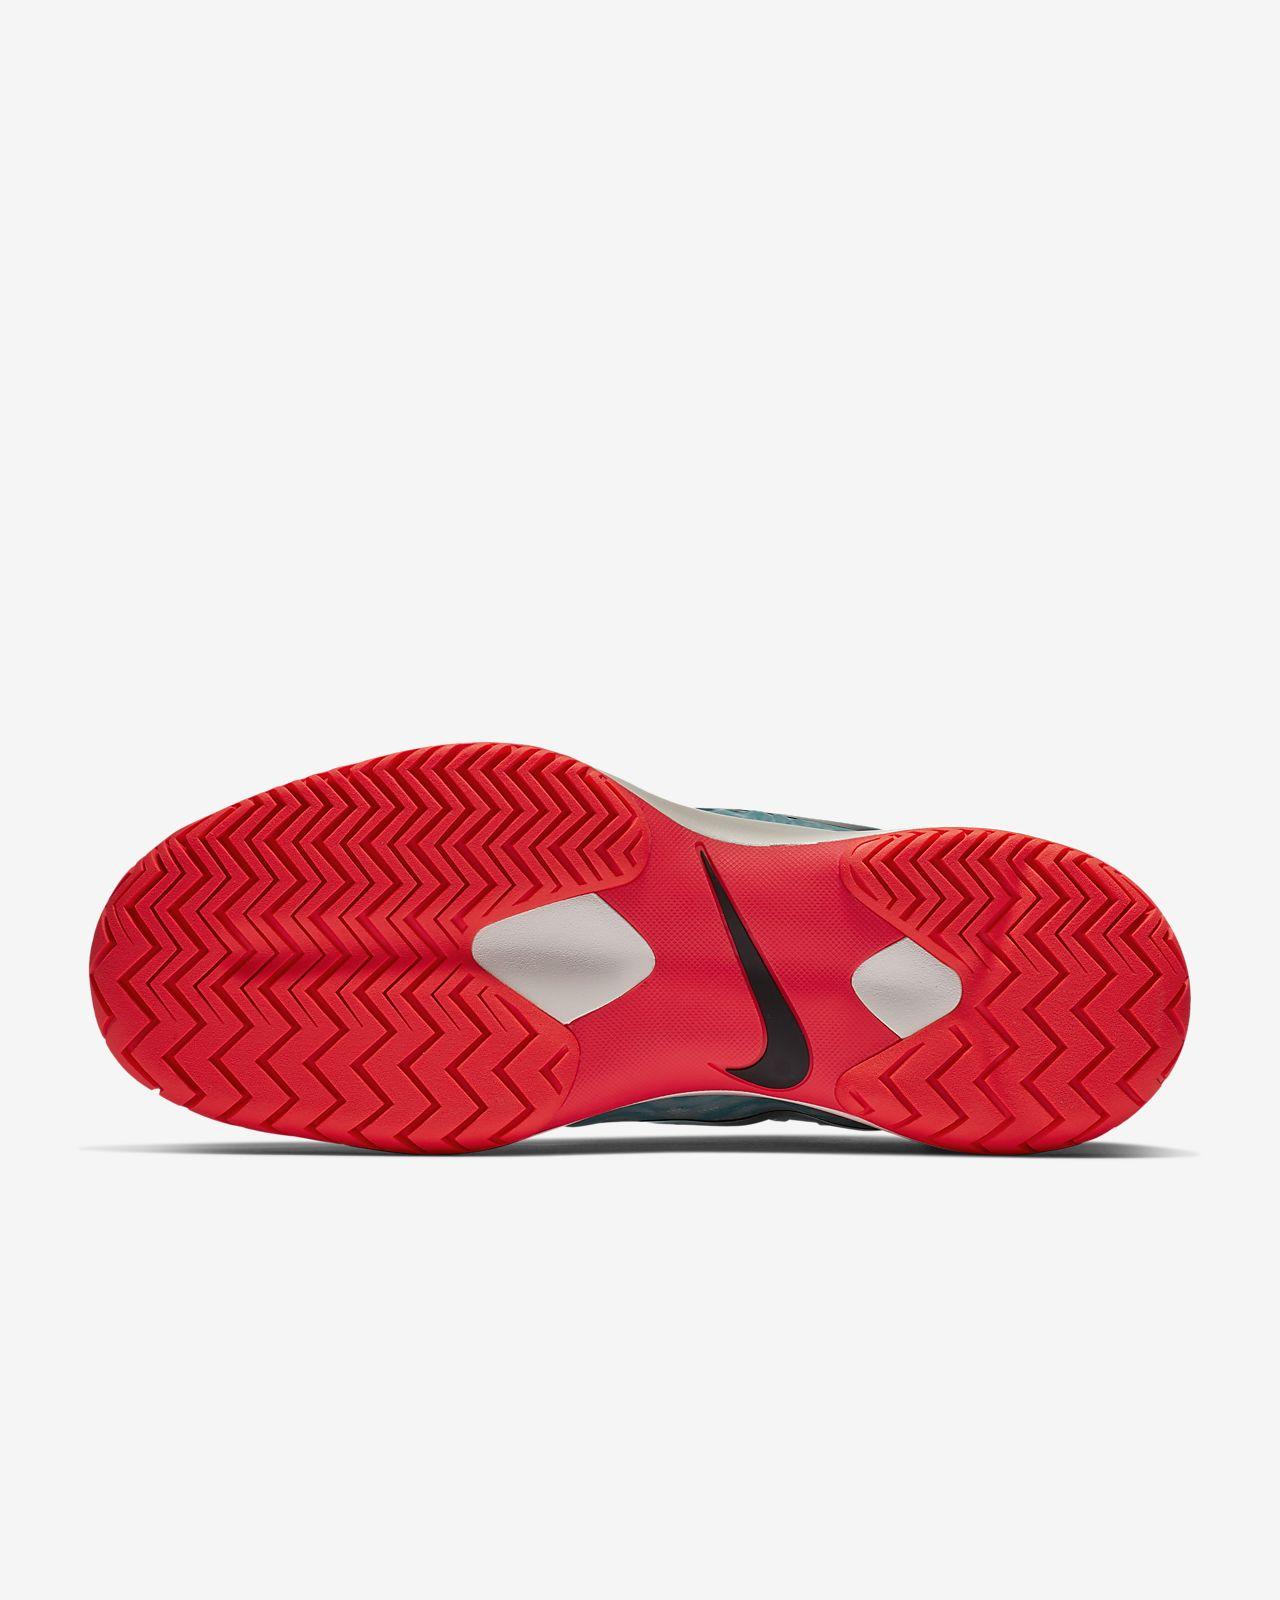 low priced b4143 ab13c ... NikeCourt Zoom Cage 3 Mens Hard Court Tennis Shoe